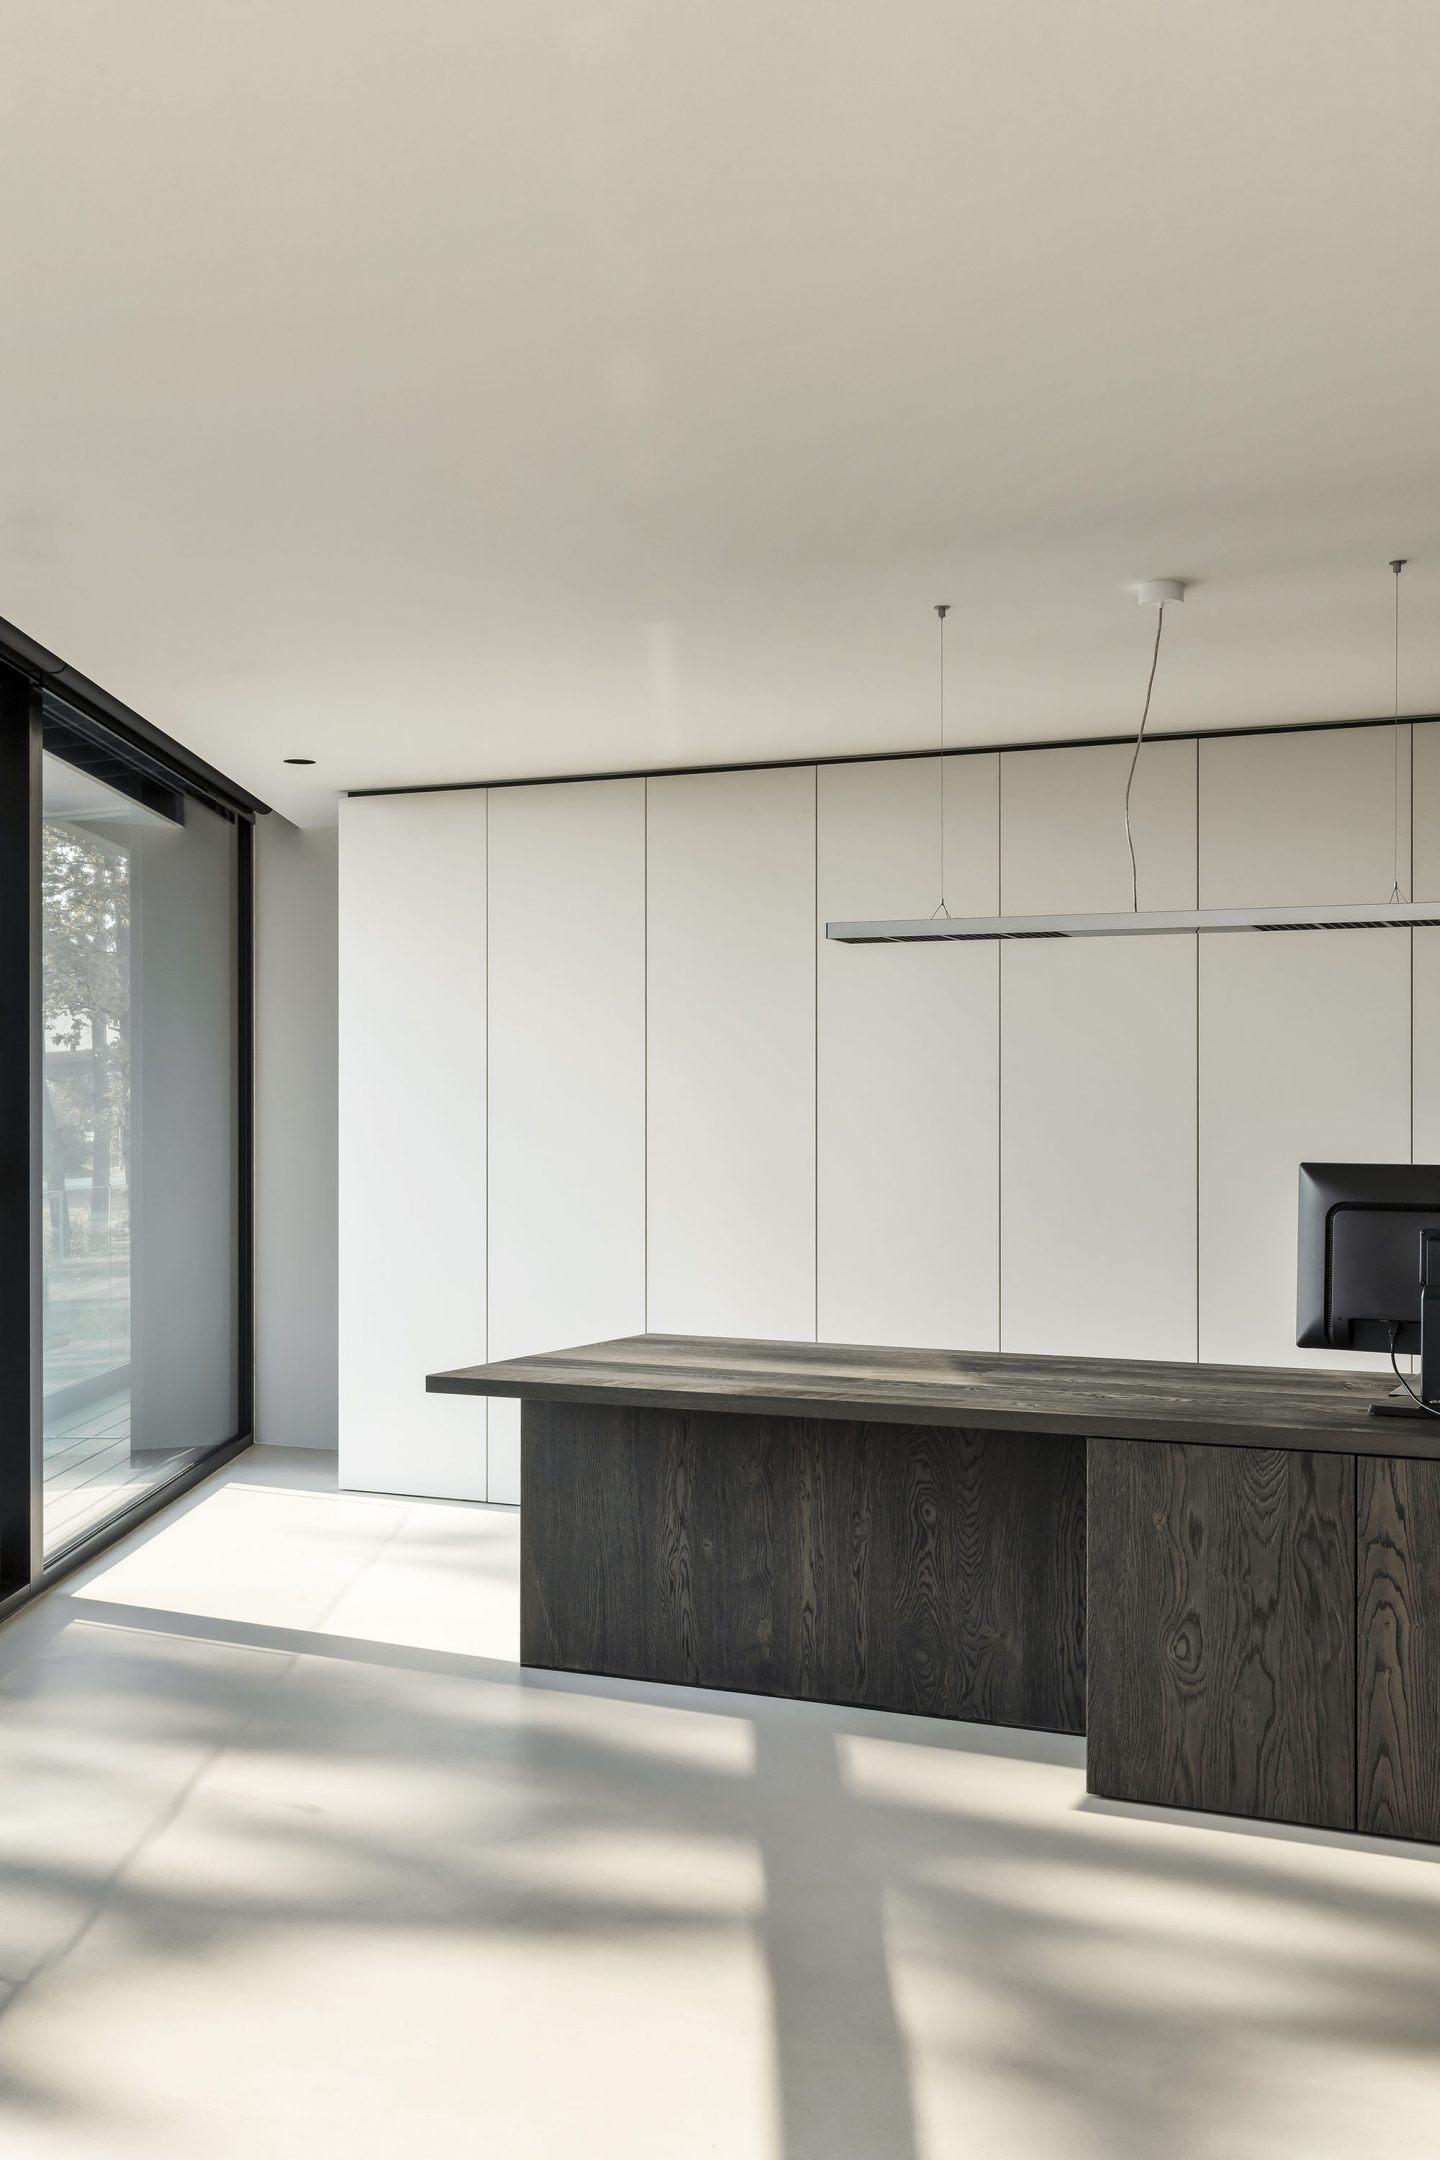 IGNANT-Architecture-Aarjan-de-Feyter-House-Ham-016